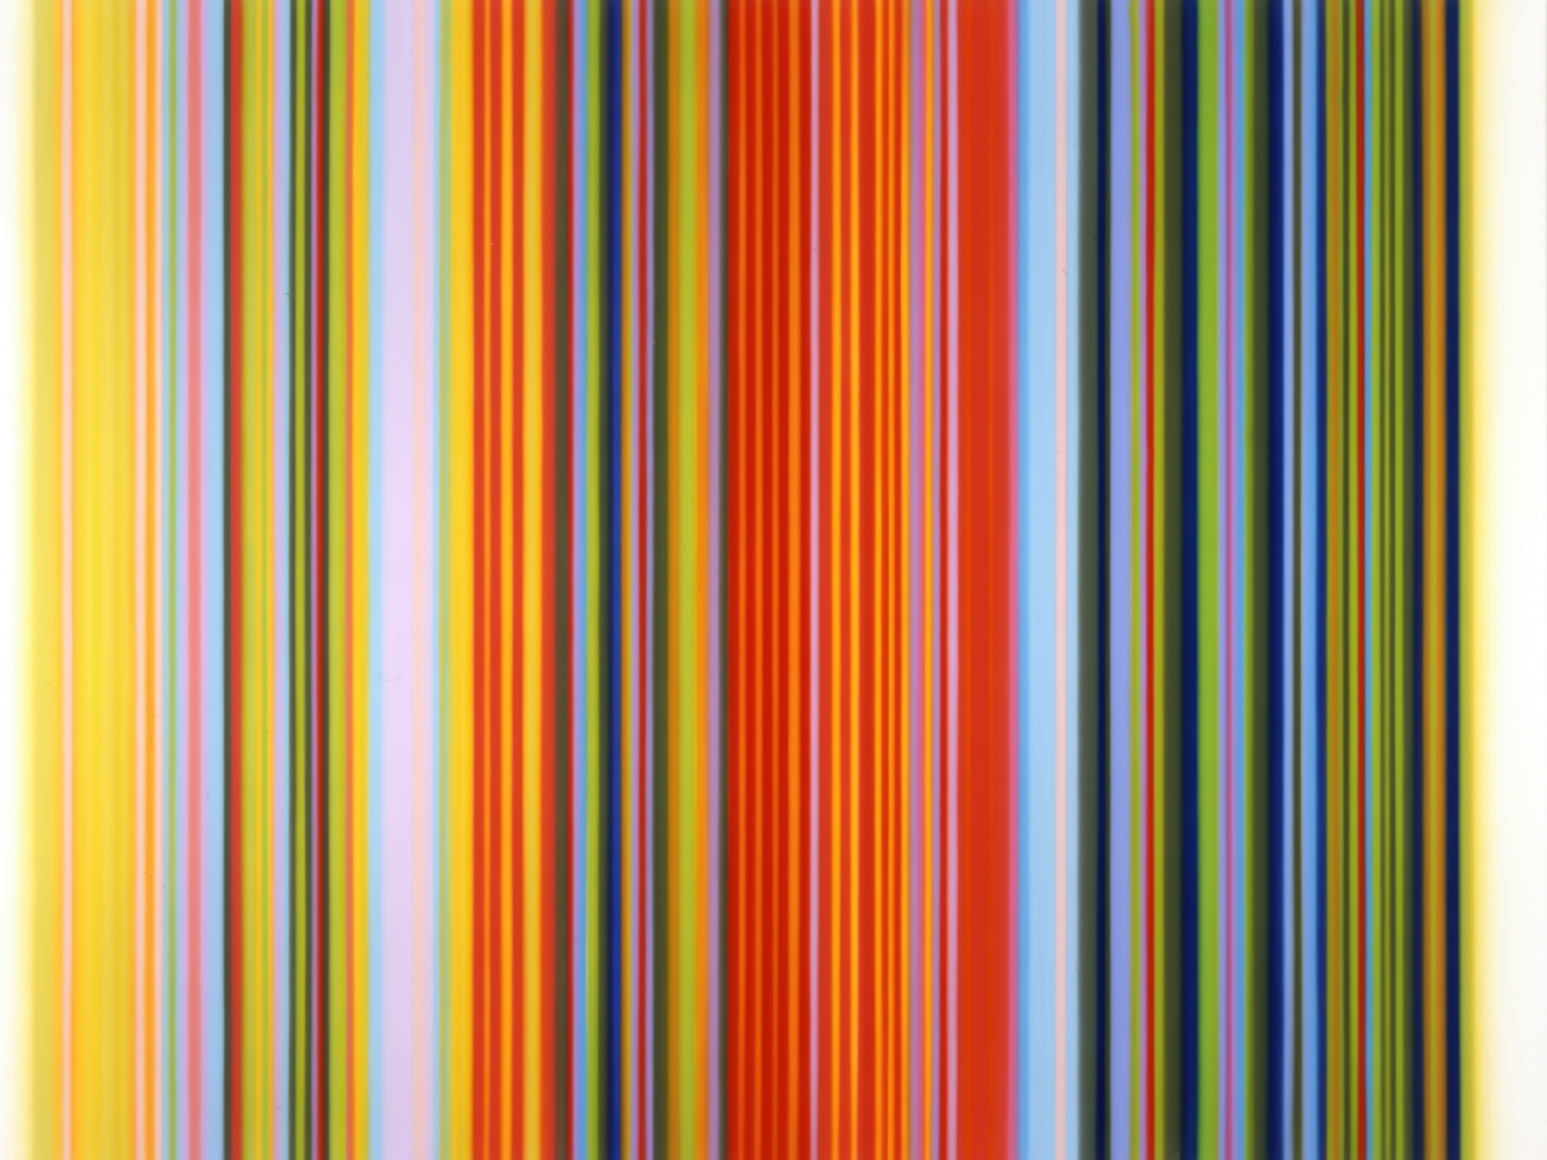 Voodoo Child (Slight Return),2002, Synthetic polymer on canvas